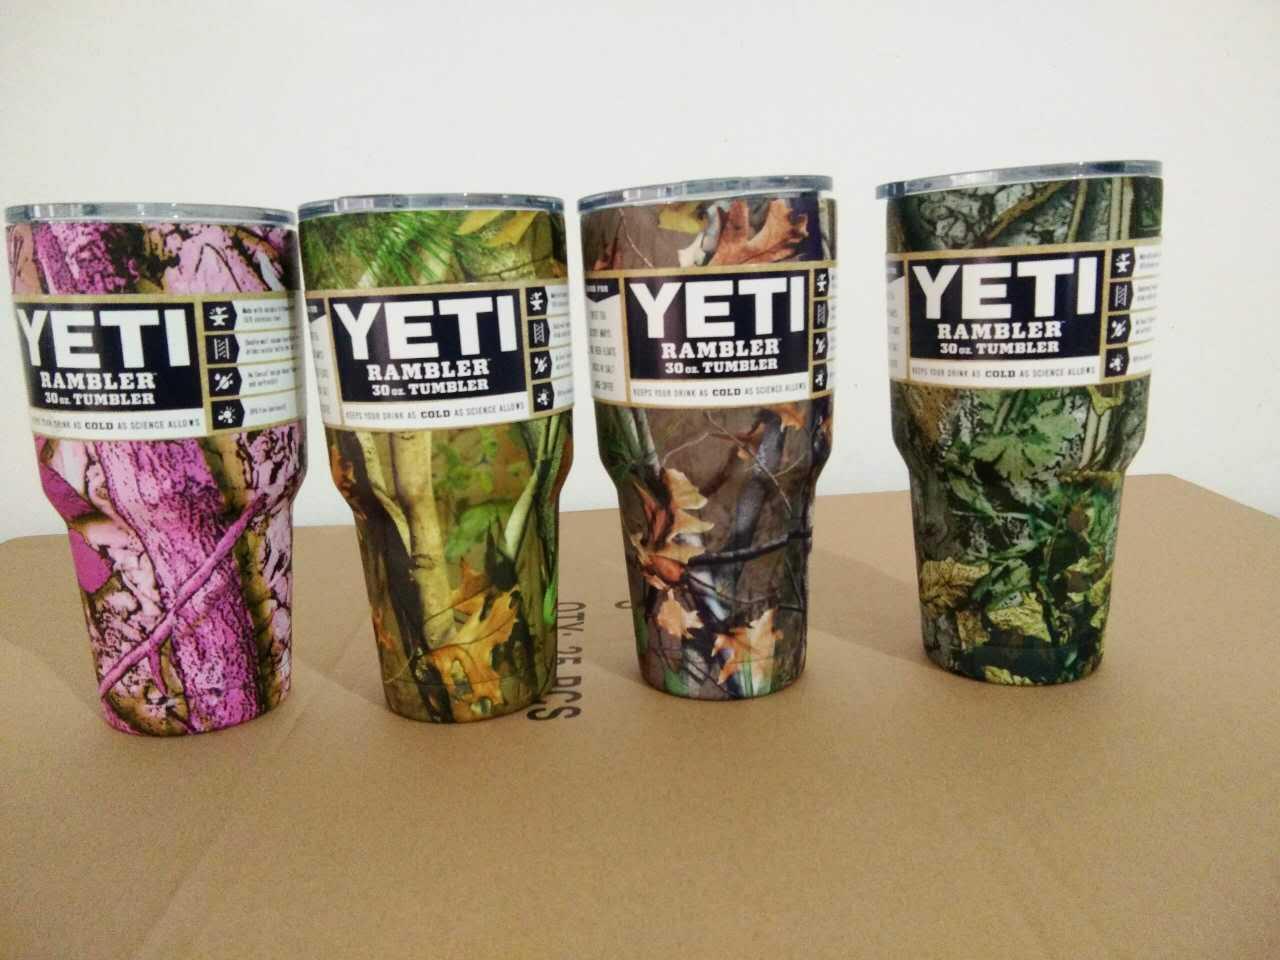 de3d5fbaa2b [Hot Item] Factory Wholesale Colored Camo 30oz Yeti Rambler, Vacuum  Insulated Colorful Yeti Tumbler Cup 30oz